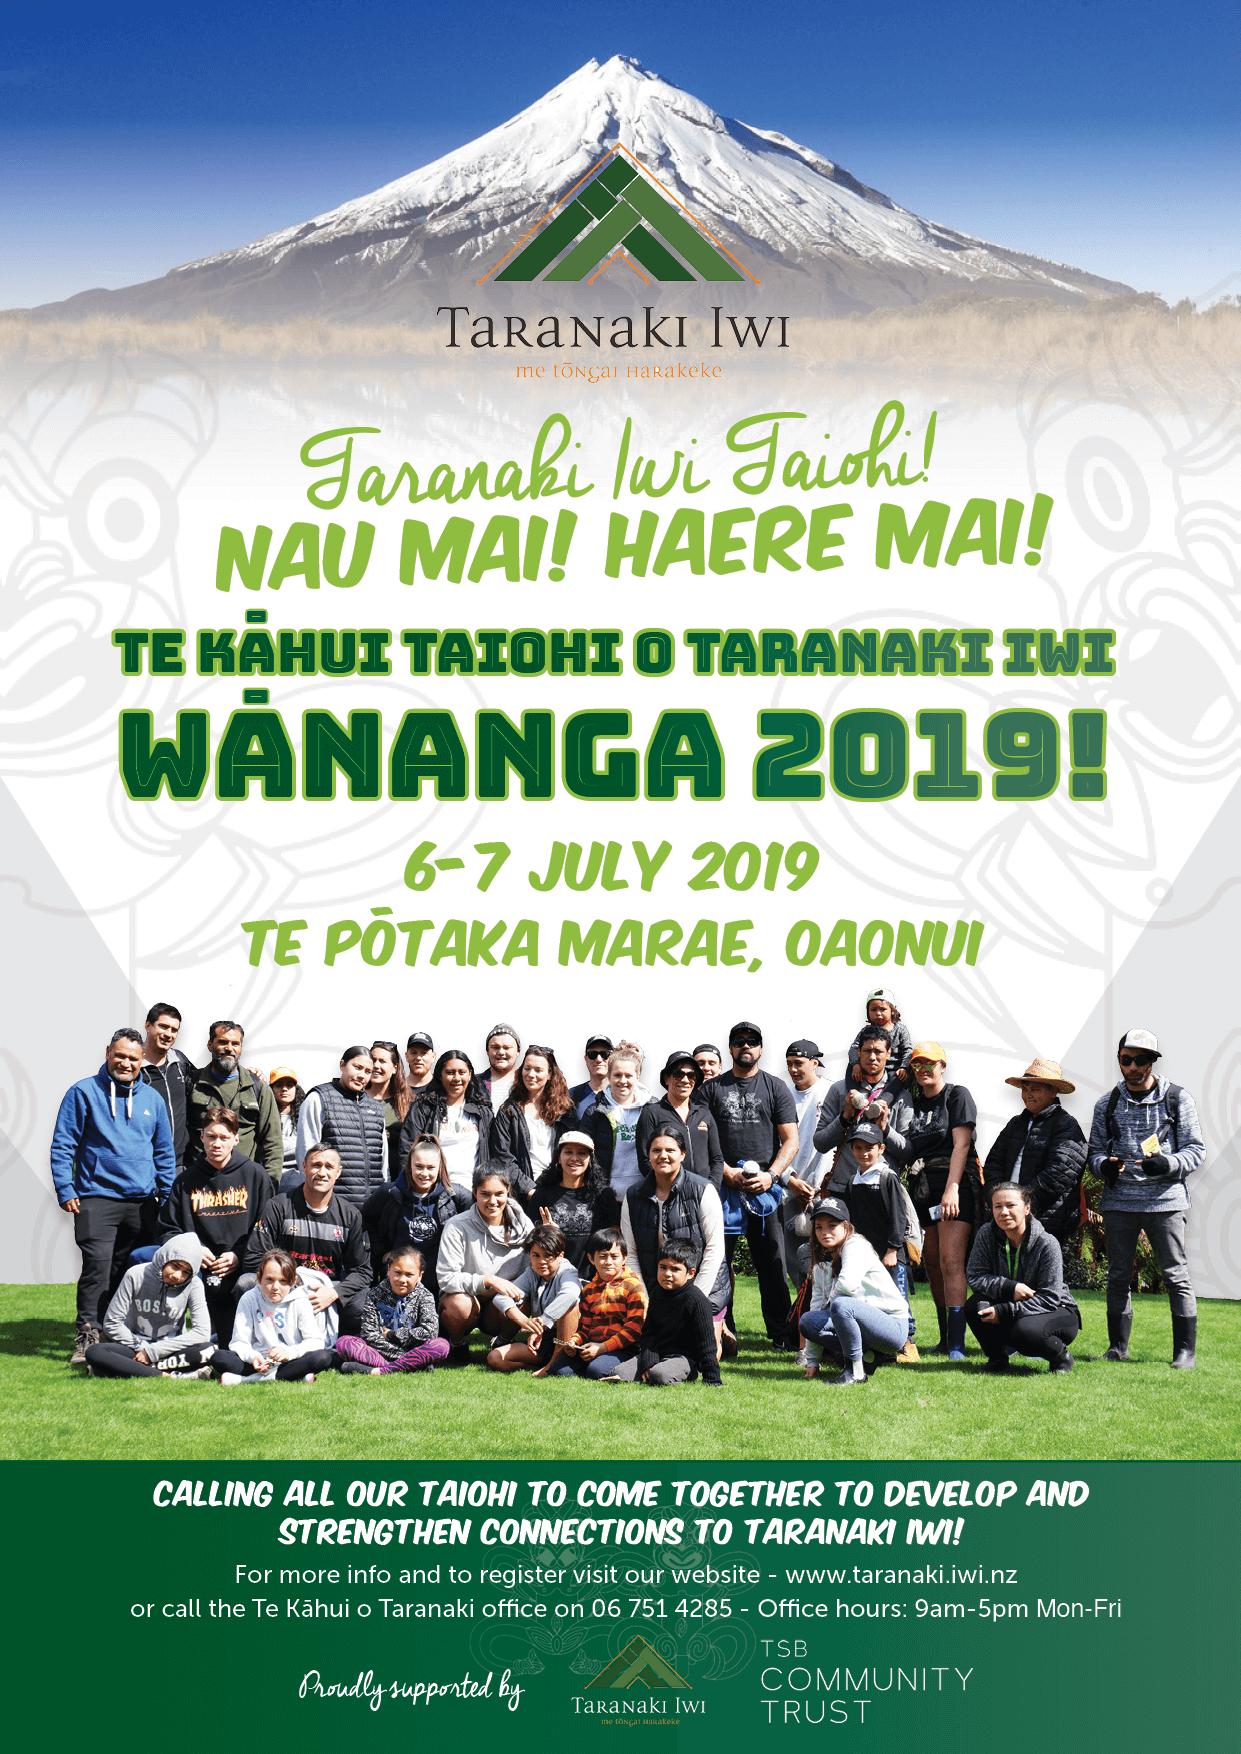 Te Kāhui Taiohi o Taranaki Iwi Wānanga 6-7 July 2019